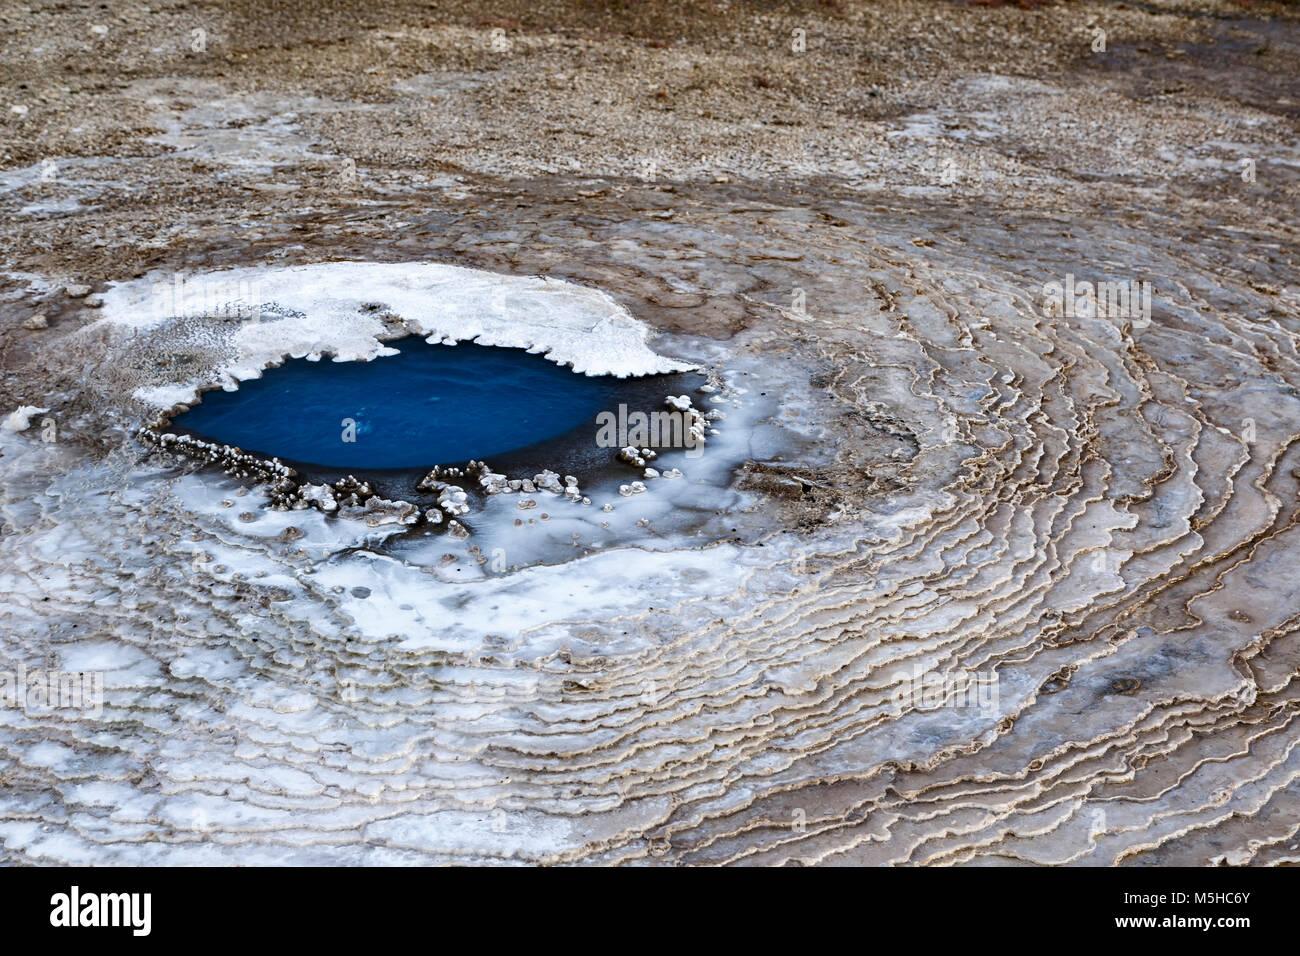 Auge der fumarole, Hveravellir, Island Stockbild